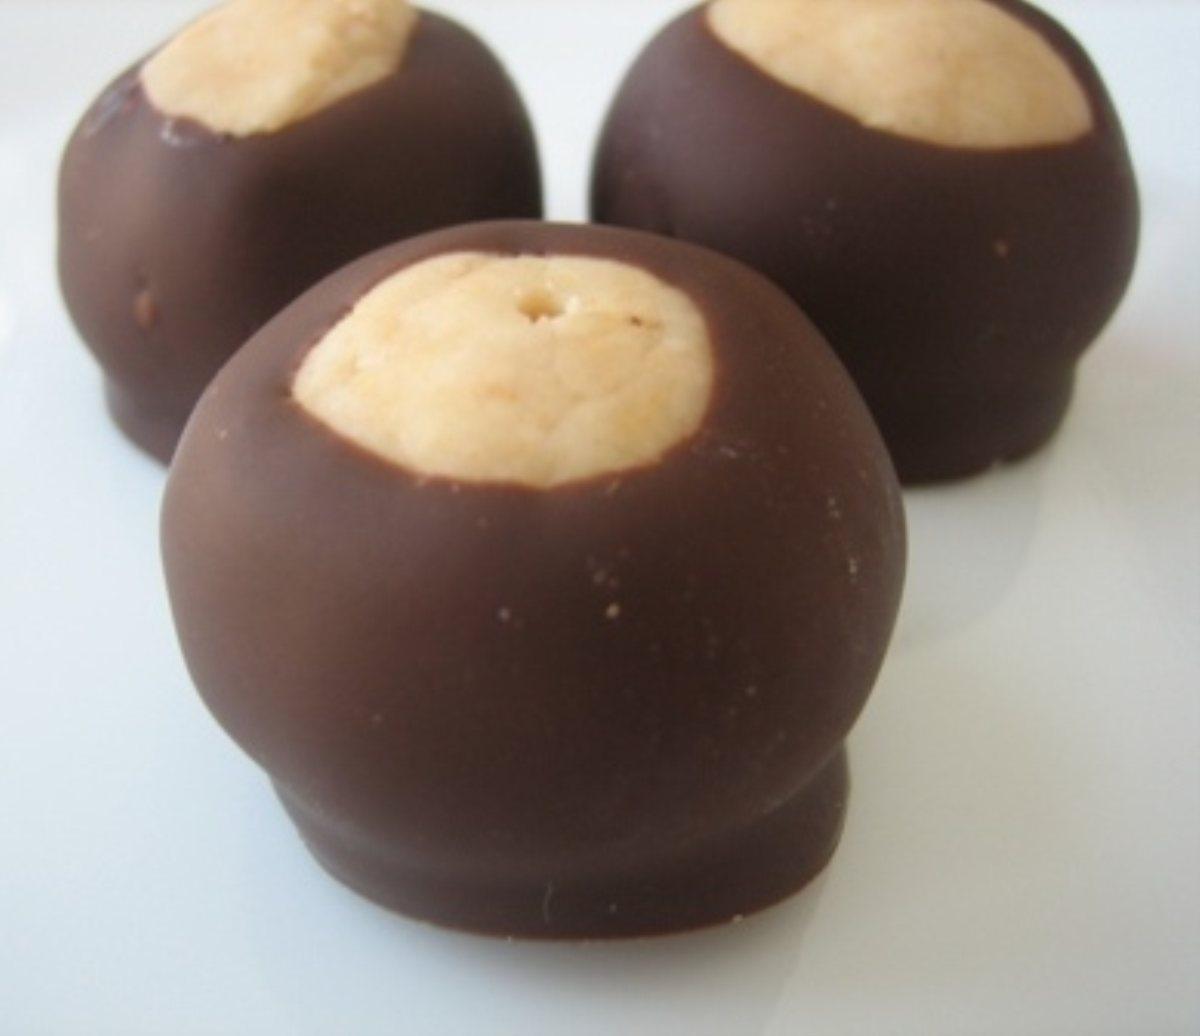 ... Desserts Cookies and Bars Debbies Buckeyes (peanut butter balls